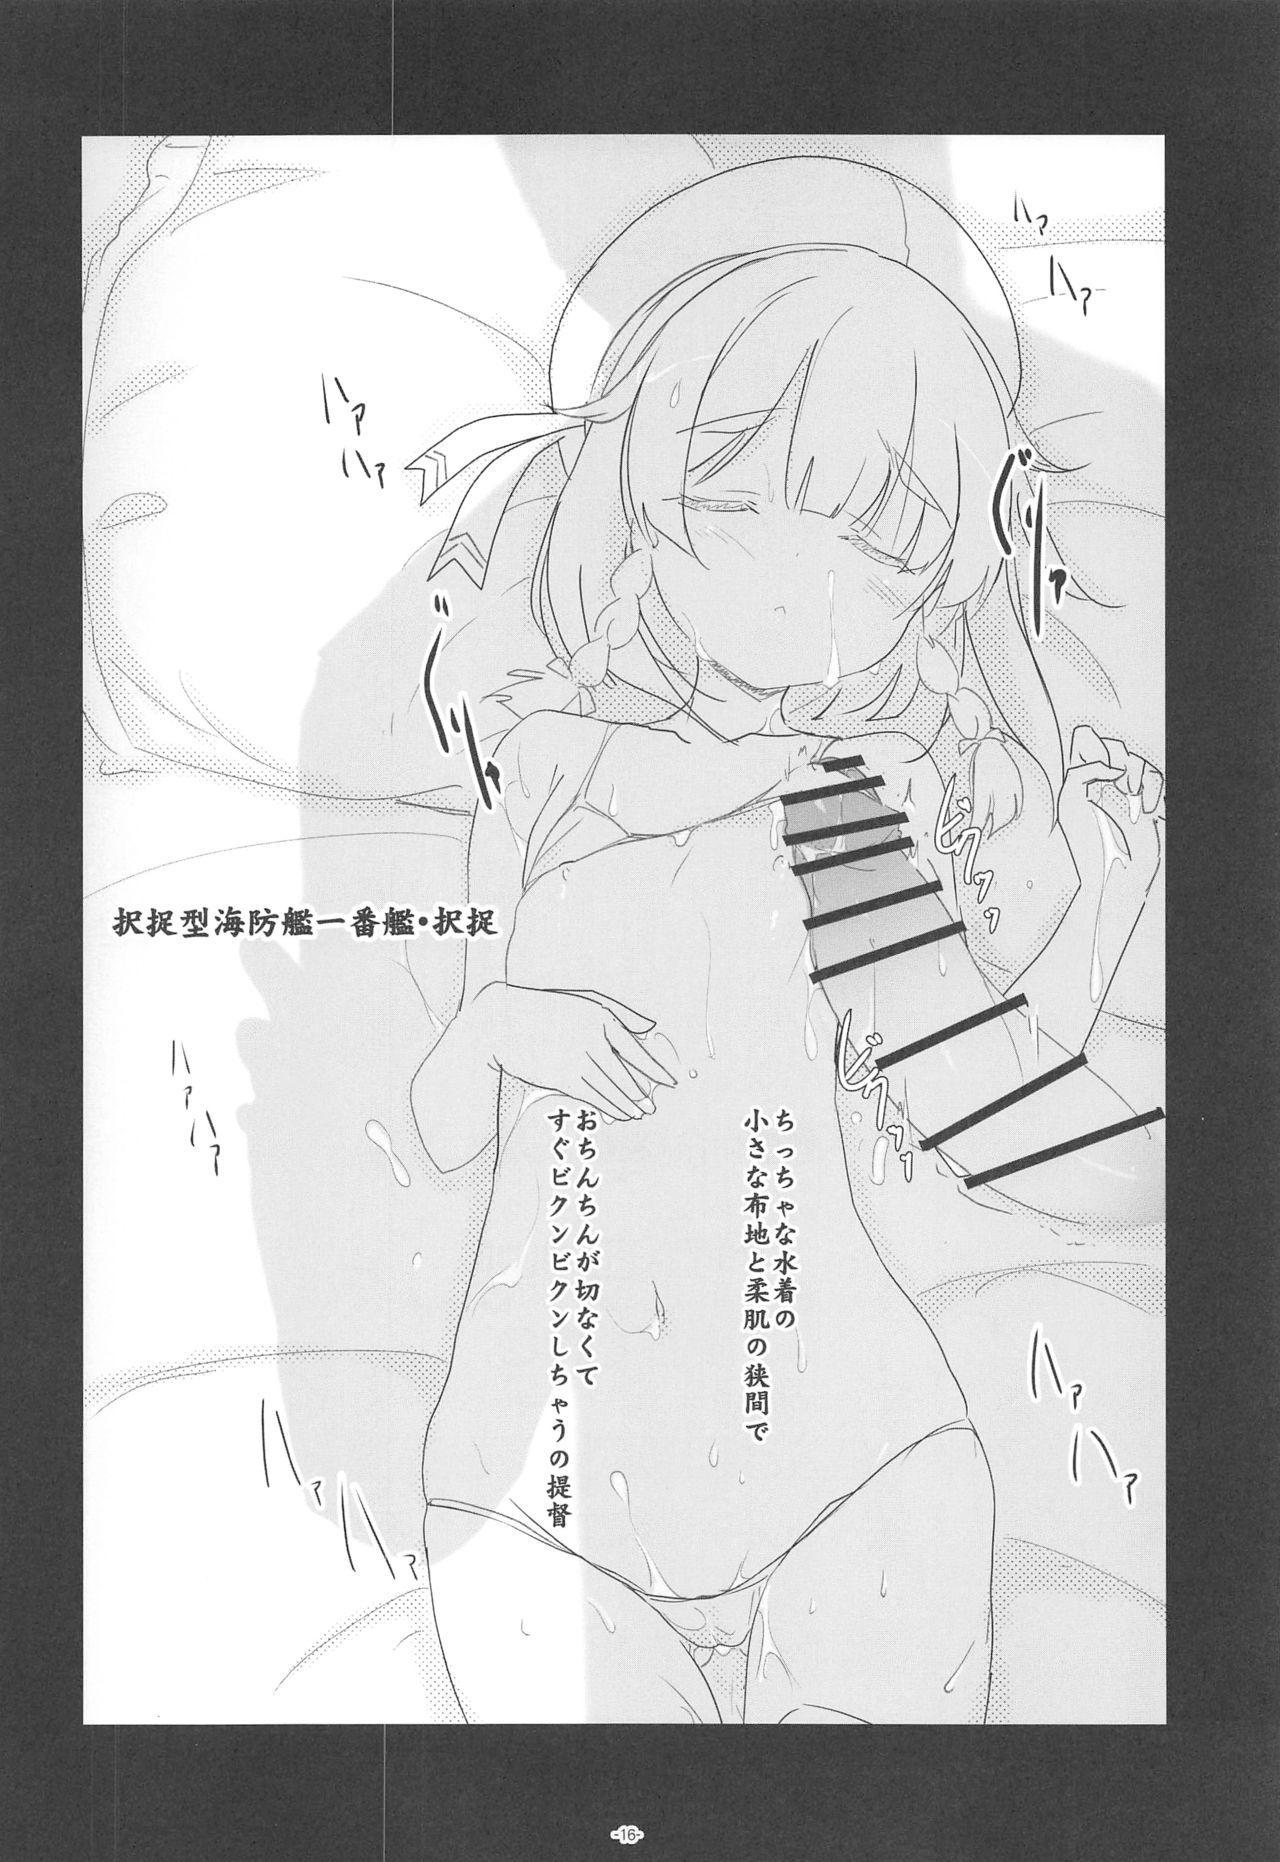 Korokoro-Manman II Korokoro:P Soushuuhen II 14